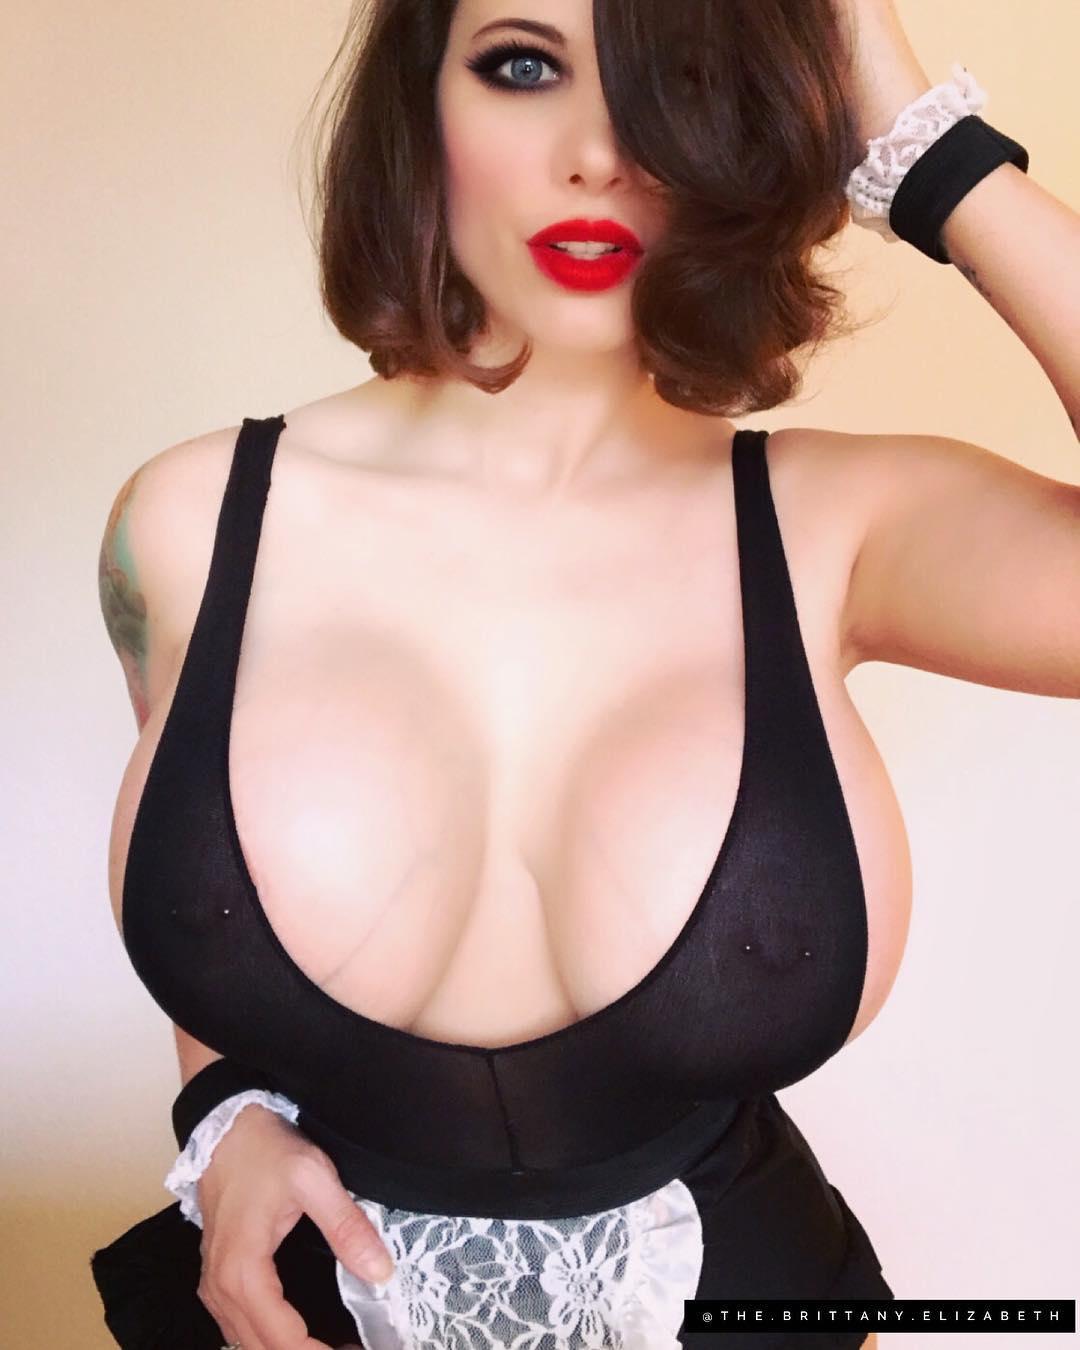 Brittany Elizabeth Pictures. Hotness Rating = 8.87/10